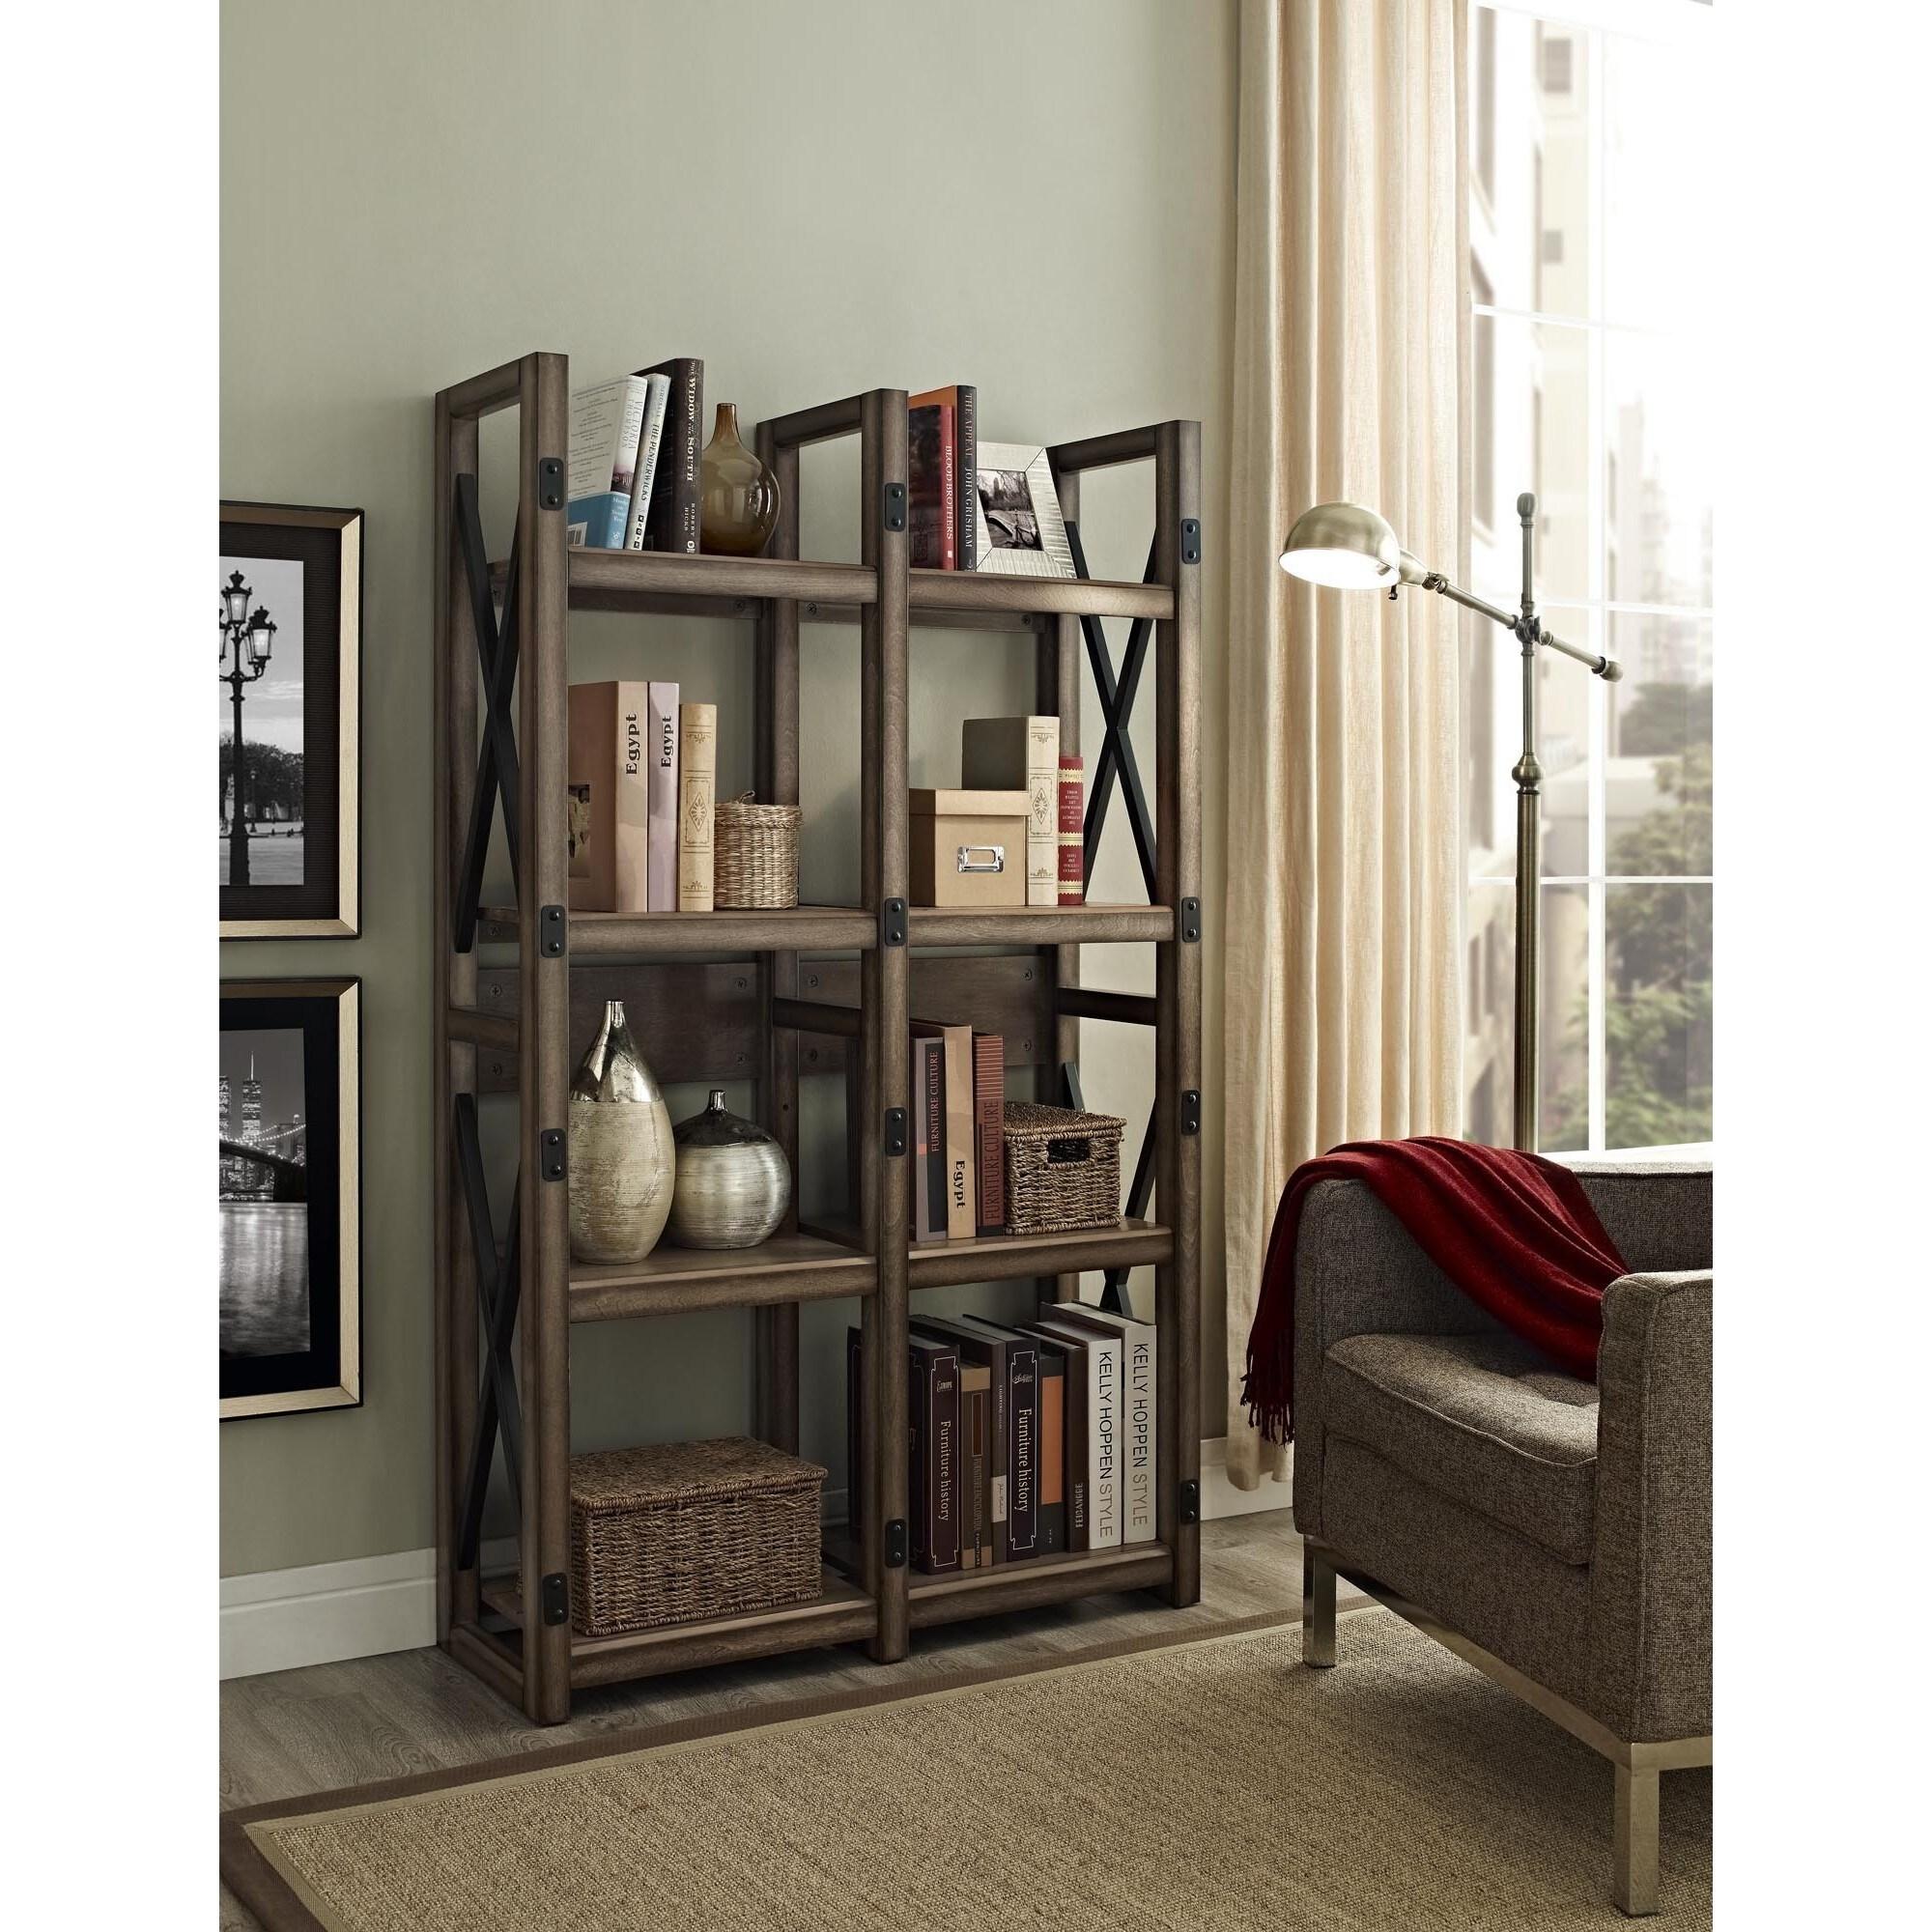 Altra wildwood rustic metal frame bookcase room divider - Open bookcase room divider ...